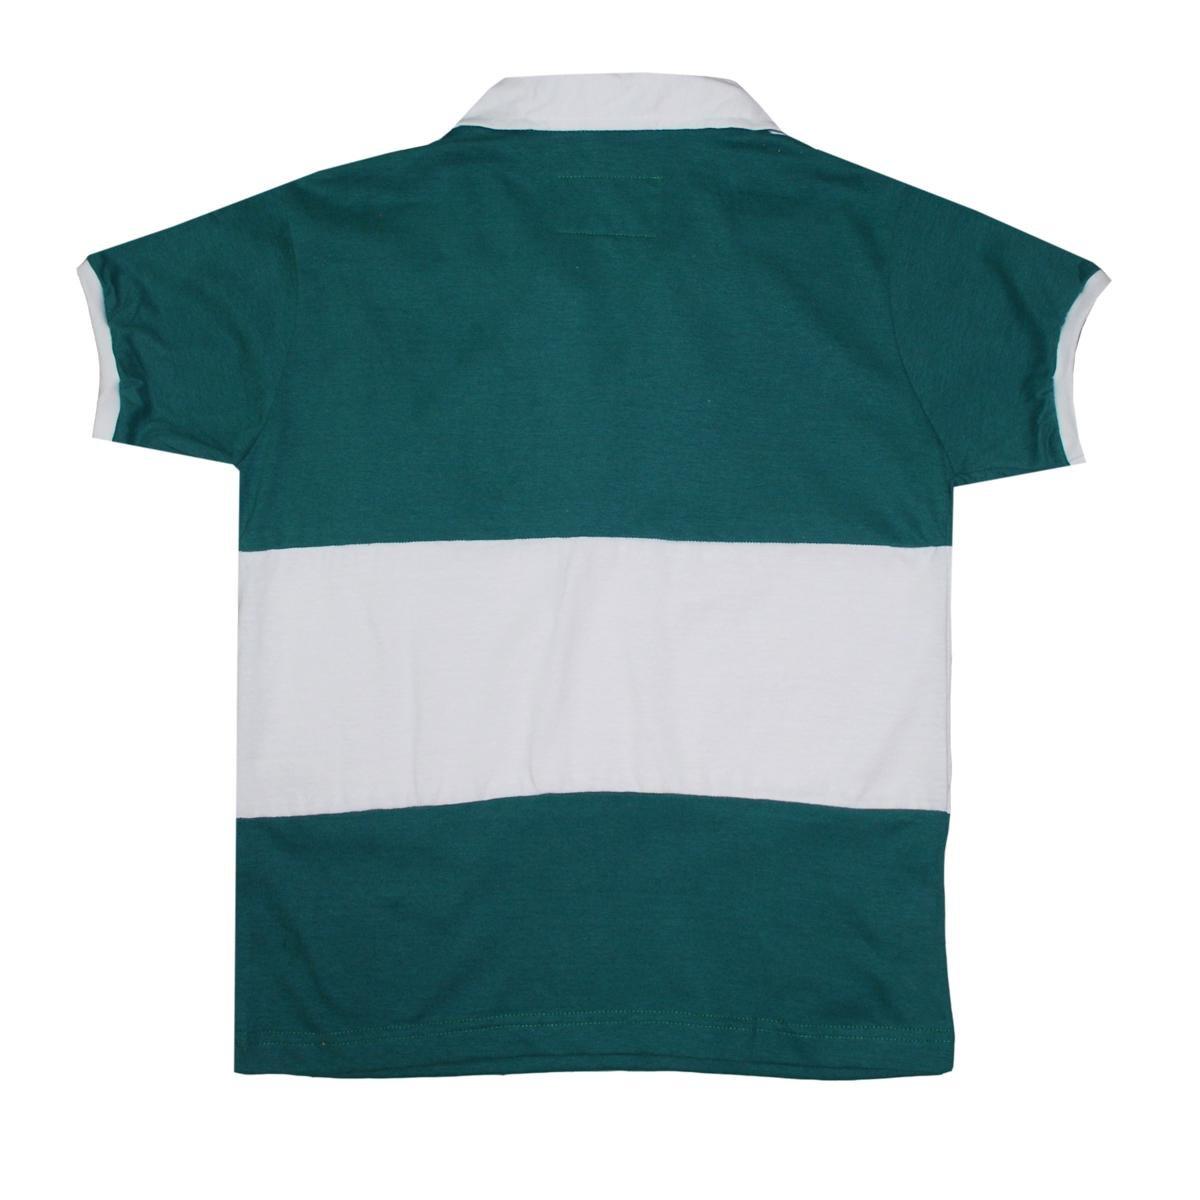 Rugby Brasil Retrô Camiseta Camiseta Infantil Liga Verde Liga 8SIXnq